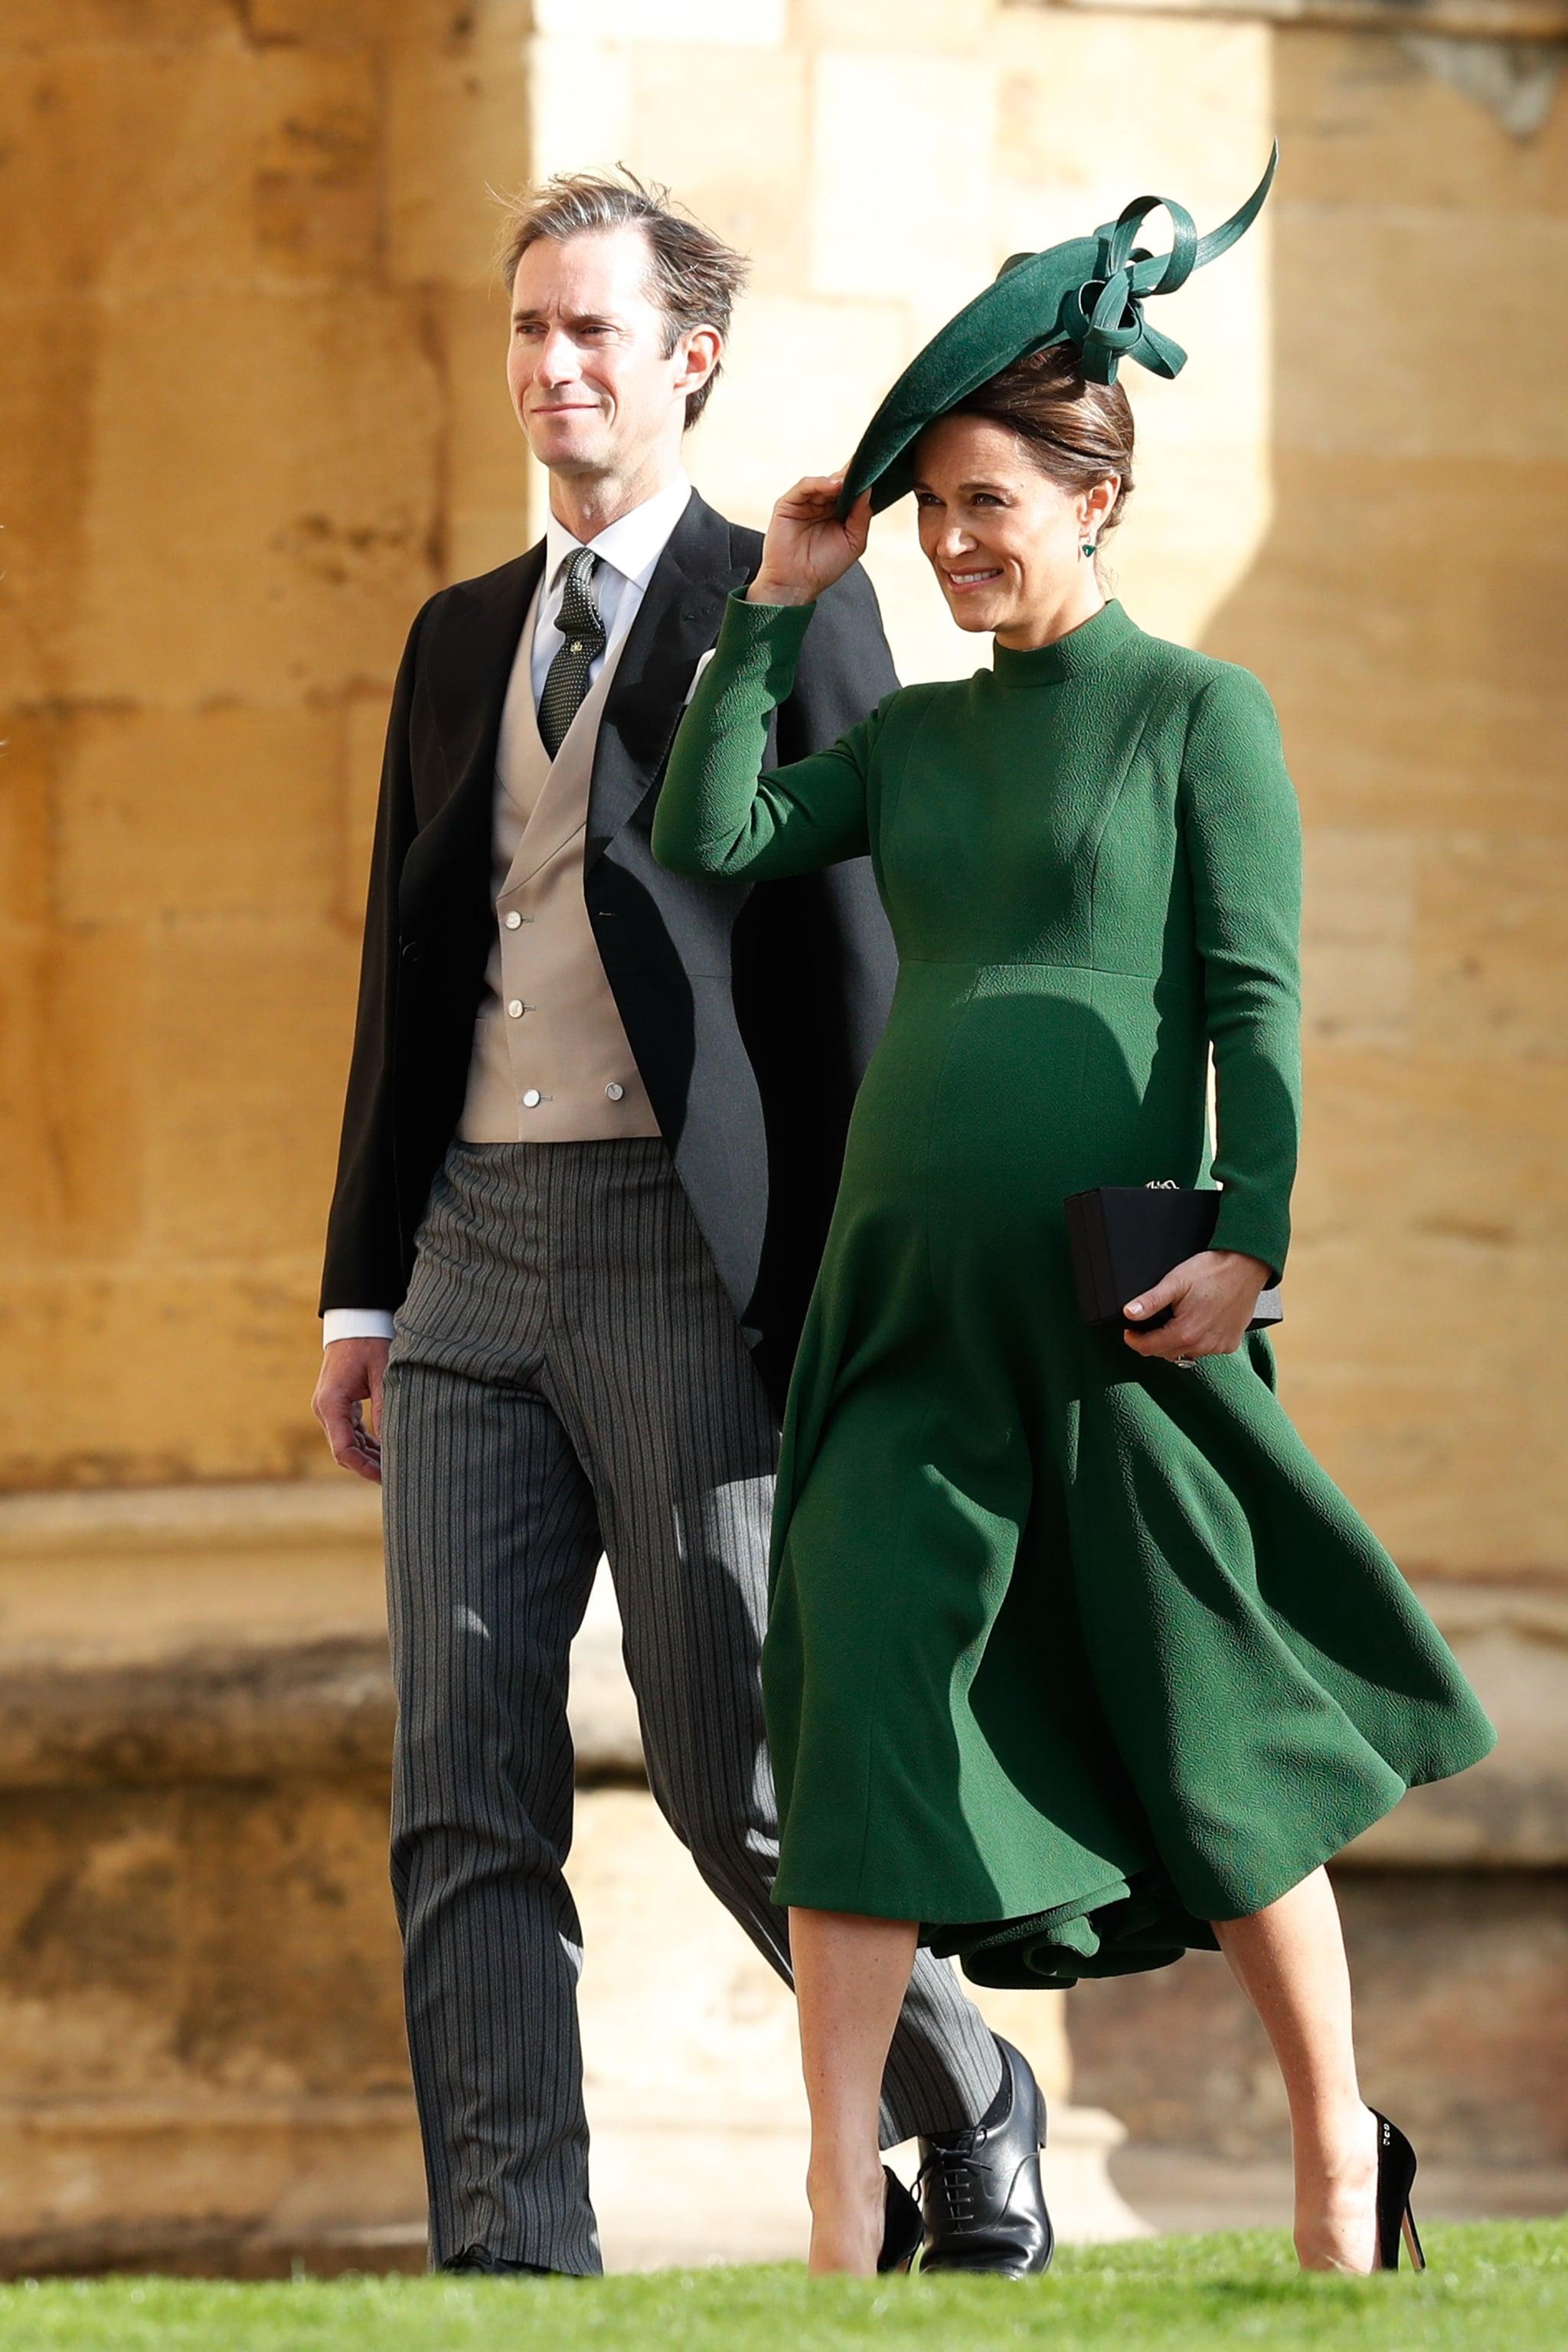 Celebrities At Princess Eugenie And Jack Brooksbank Wedding Popsugar Celebrity London,uk, 13t july 2015 : celebrities at princess eugenie and